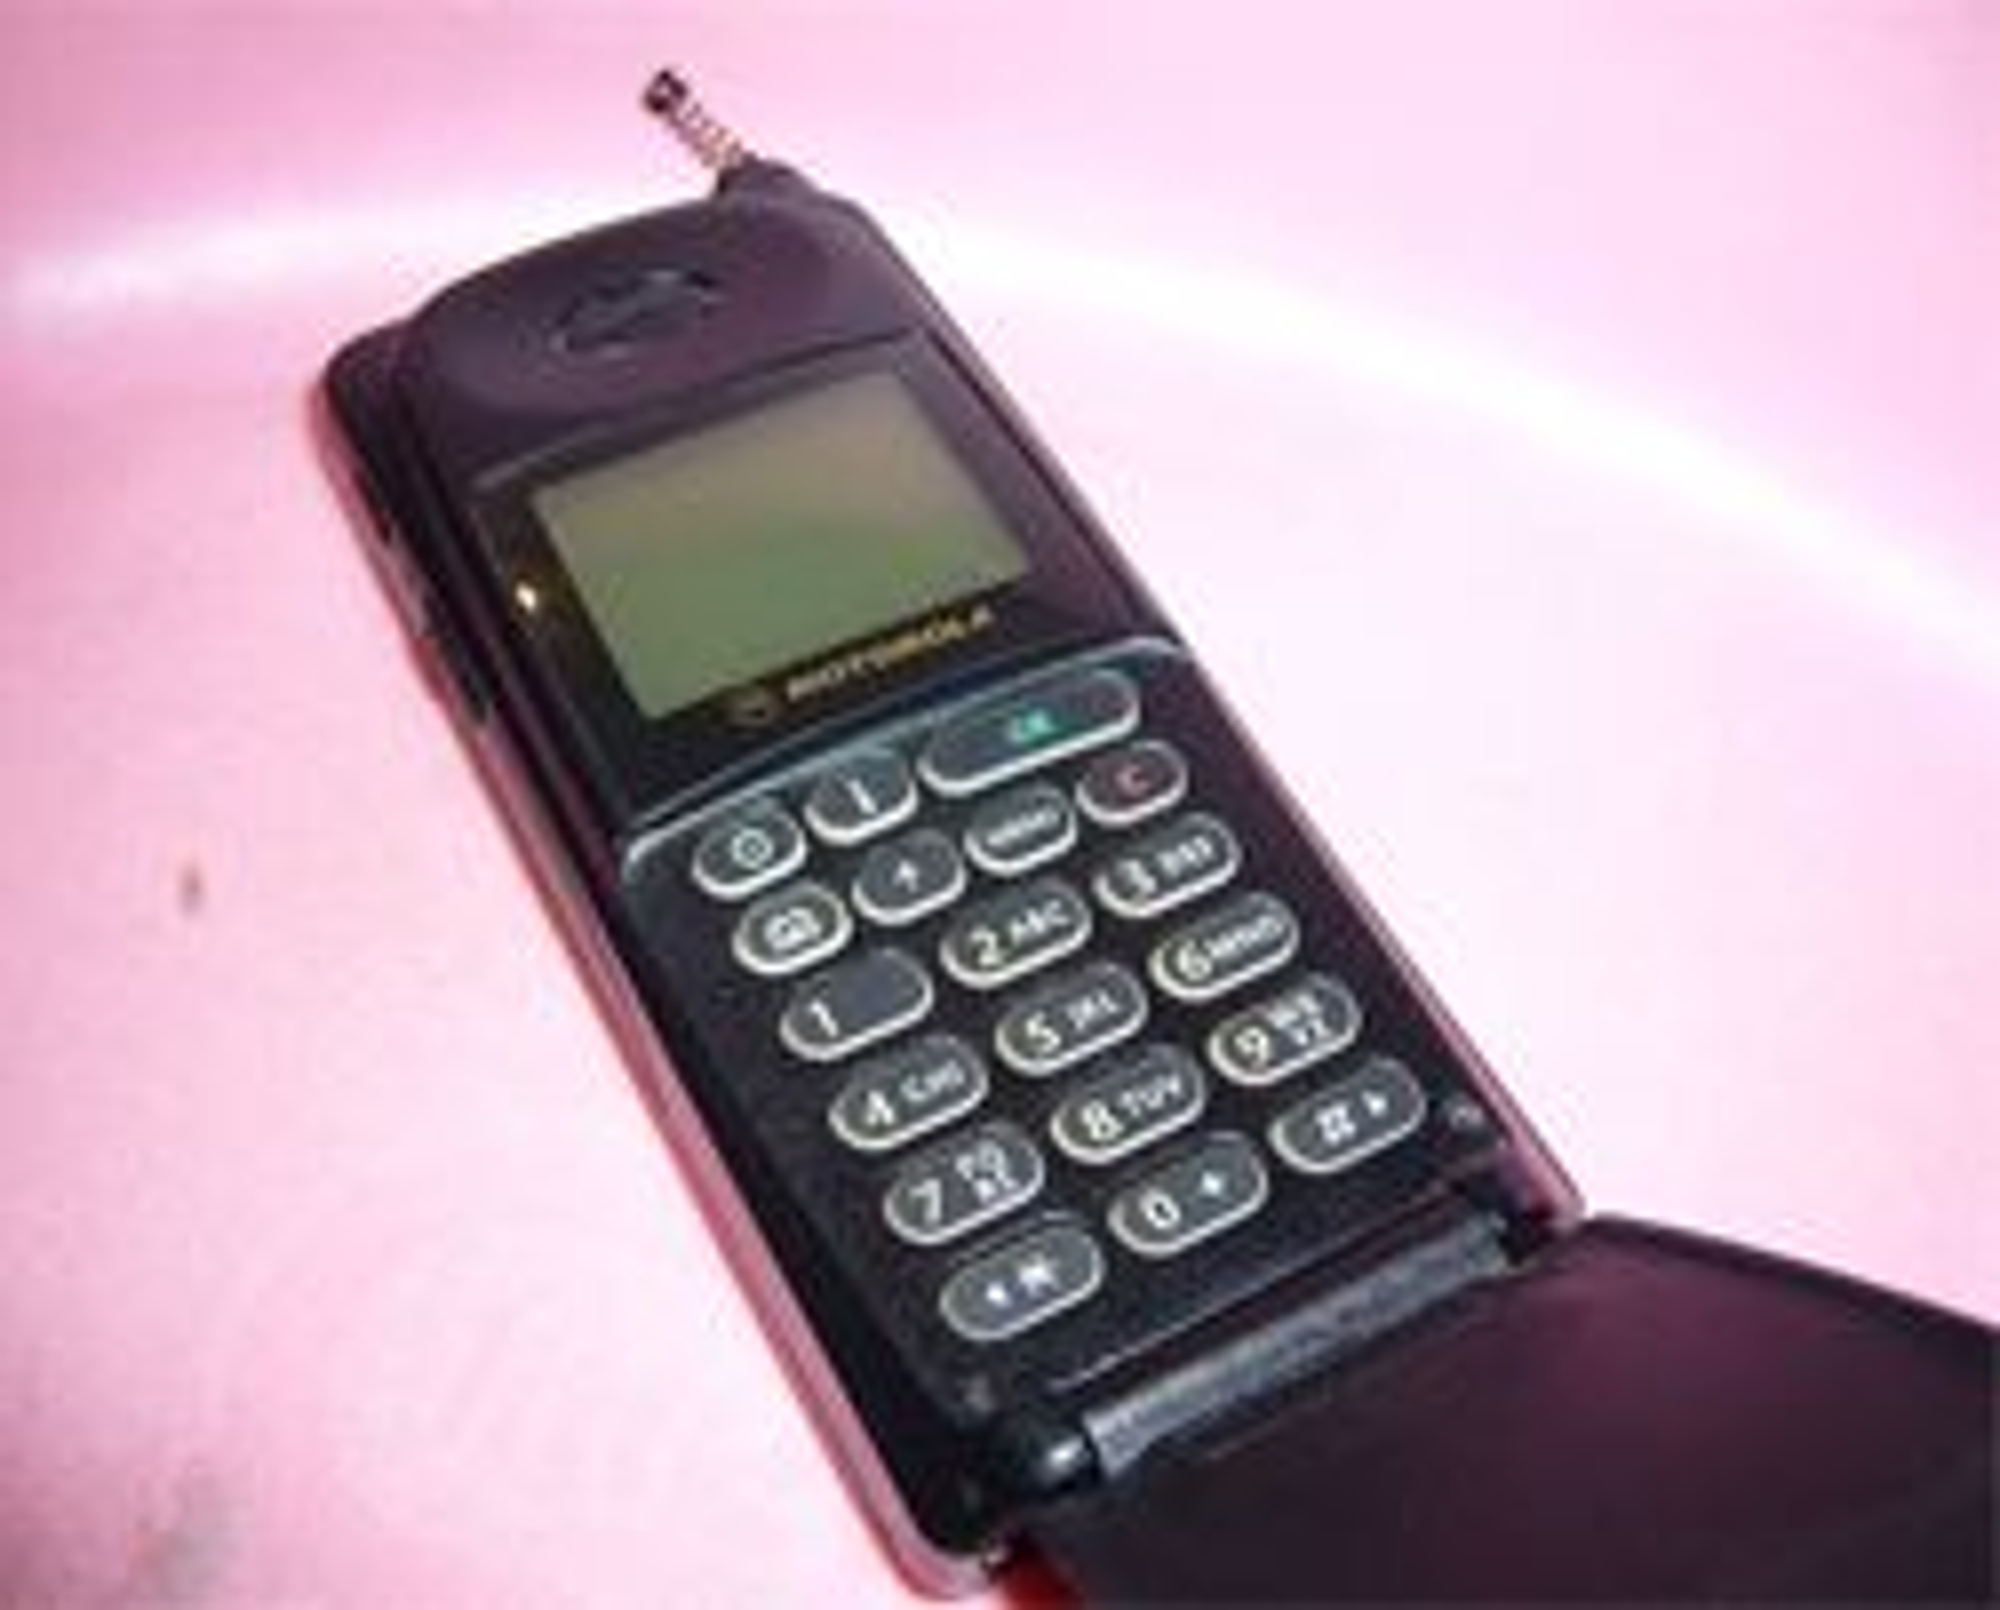 Motorola MicroTAC International 8700 var en sværing. (Foto: Wikimedia Commons)